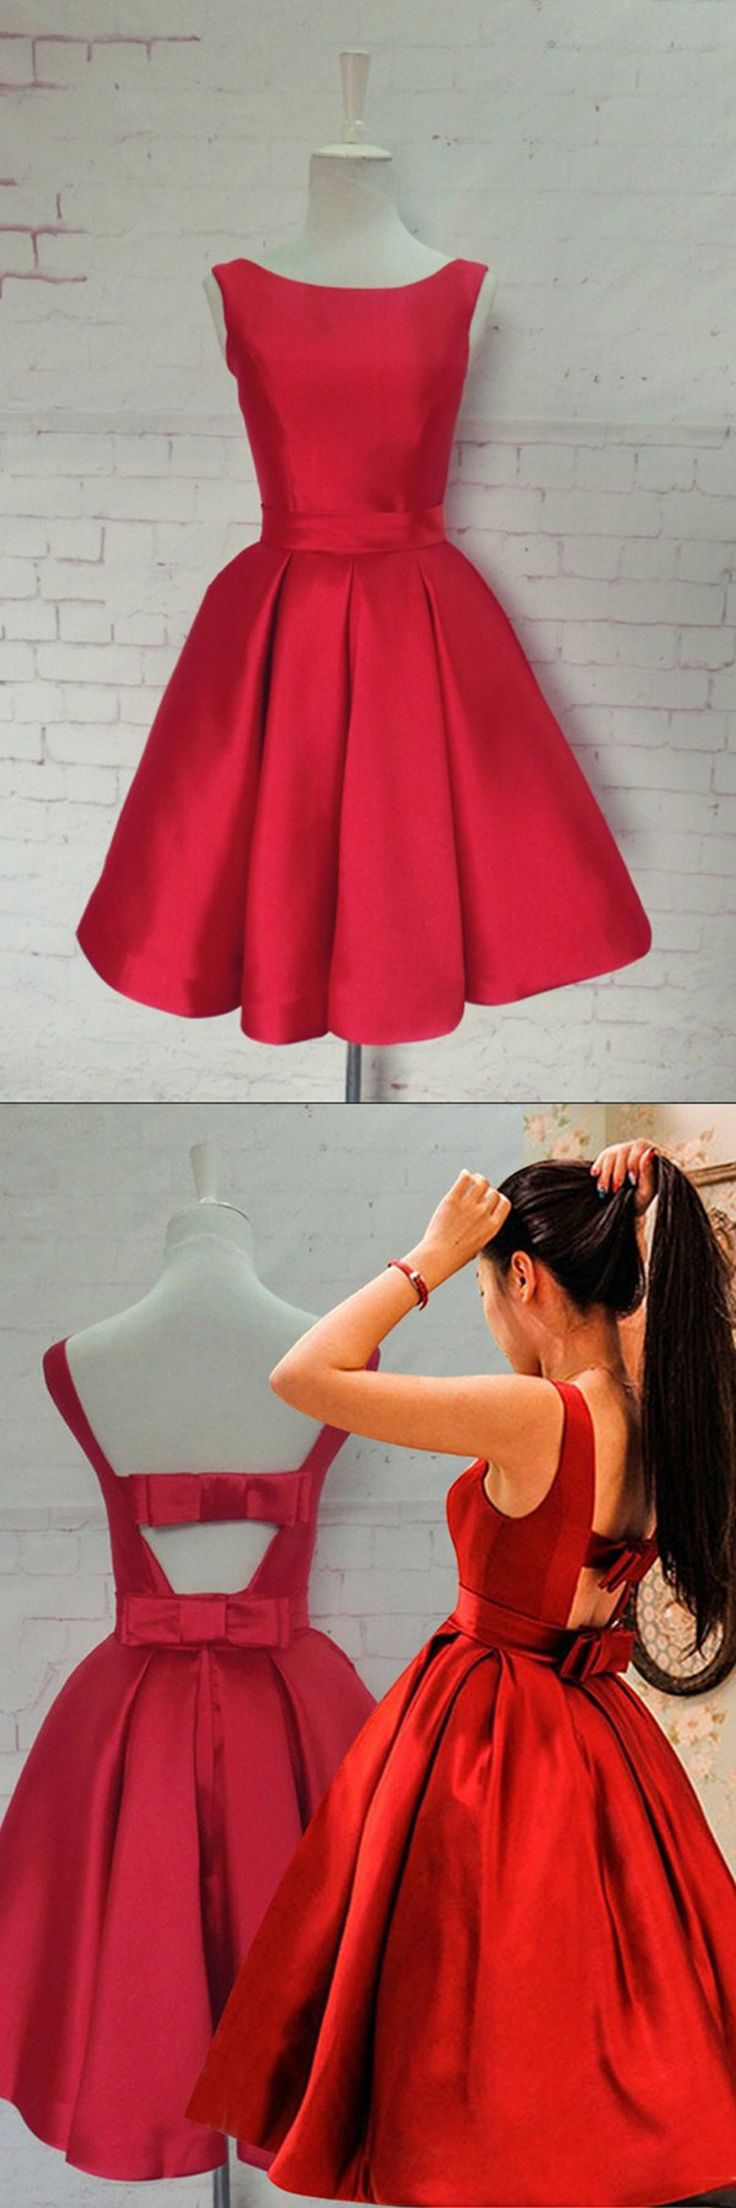 2016 homecoming dress,red homecoming dress,vintaqge homecoming dress,knee-length homecoming dress,party dress,prom dress,short prom dress,chic homecoming dress